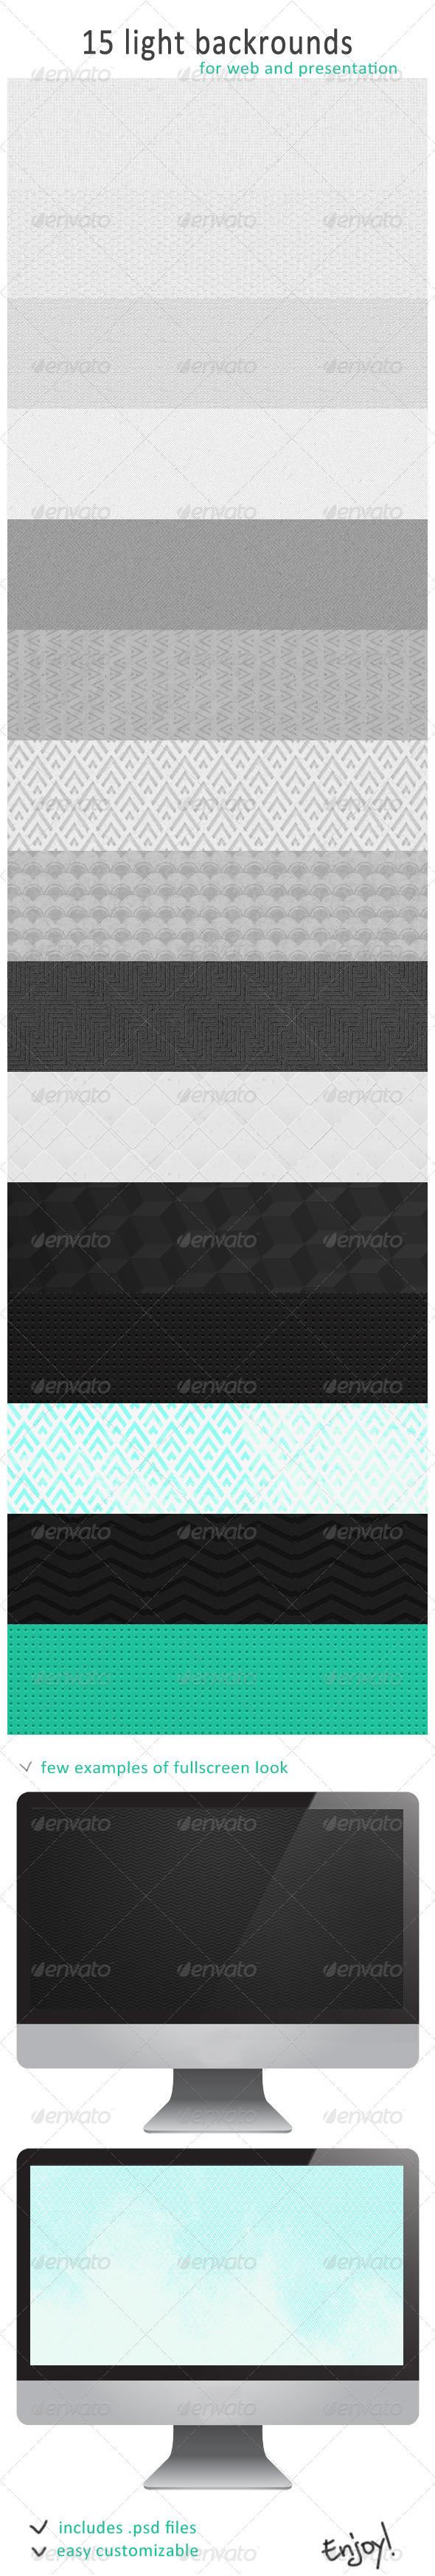 15 Light Backgrounds - Patterns Backgrounds